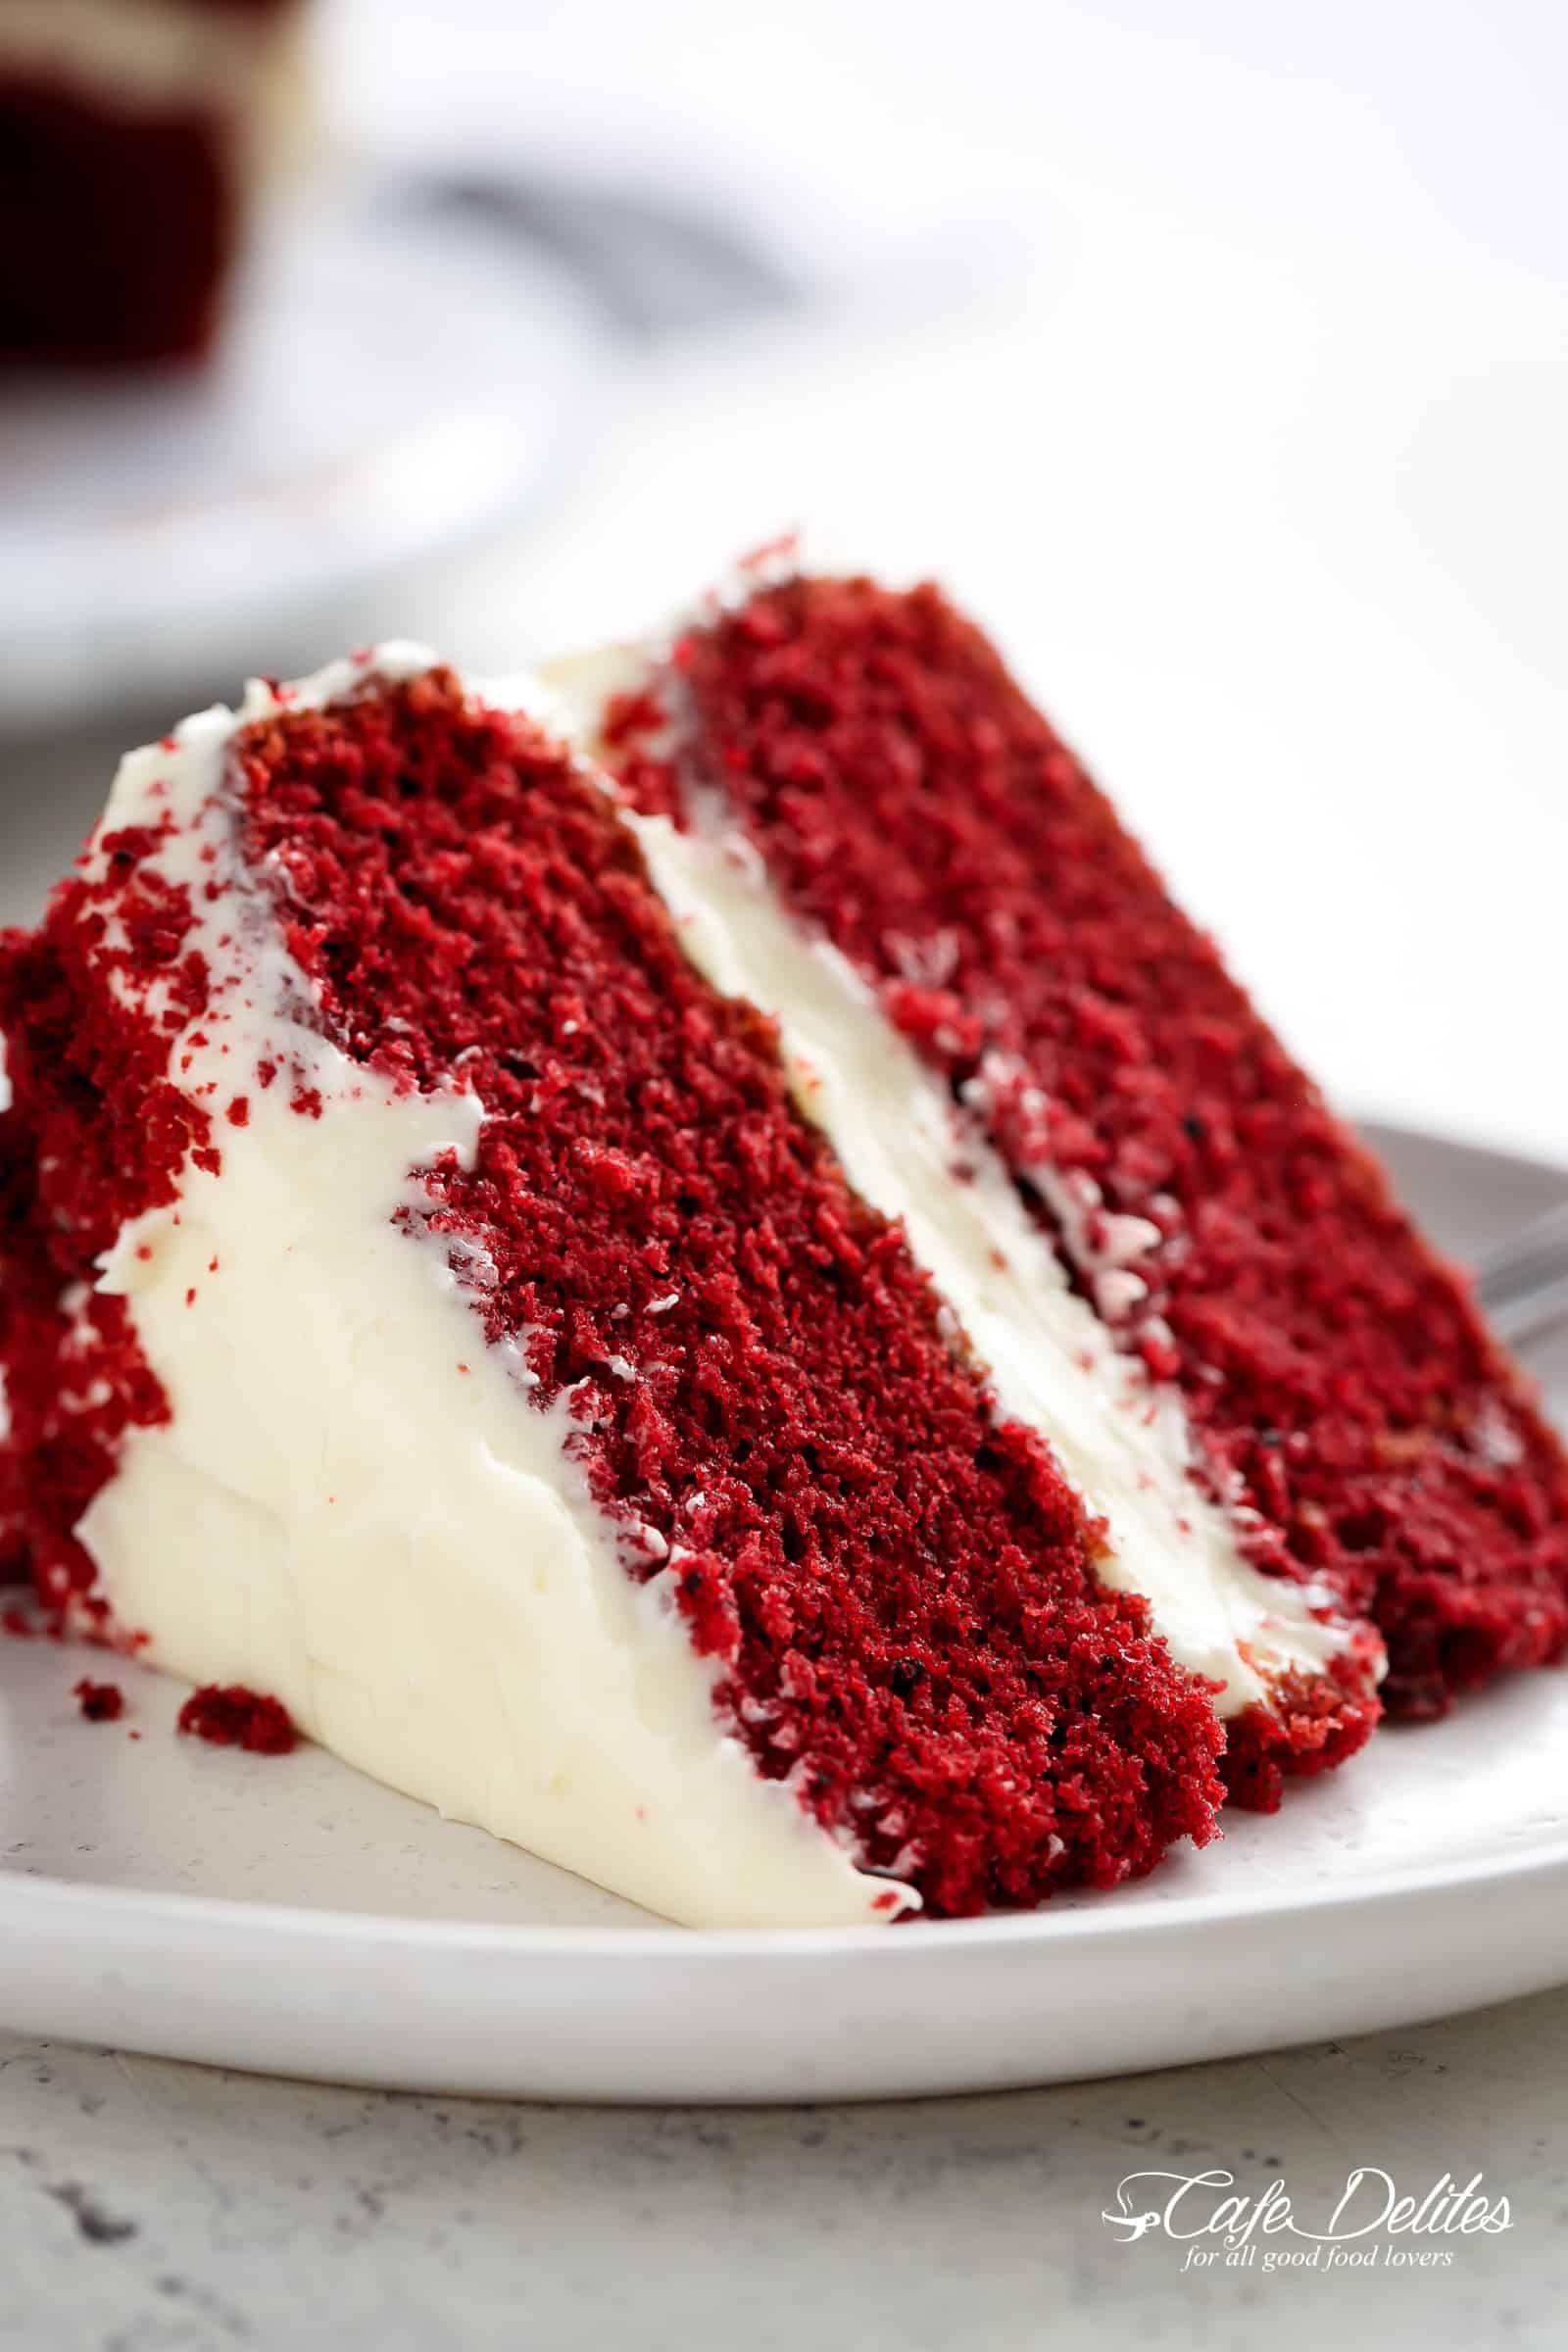 Best Red Velvet Cake  Best Red Velvet Cake Cafe Delites